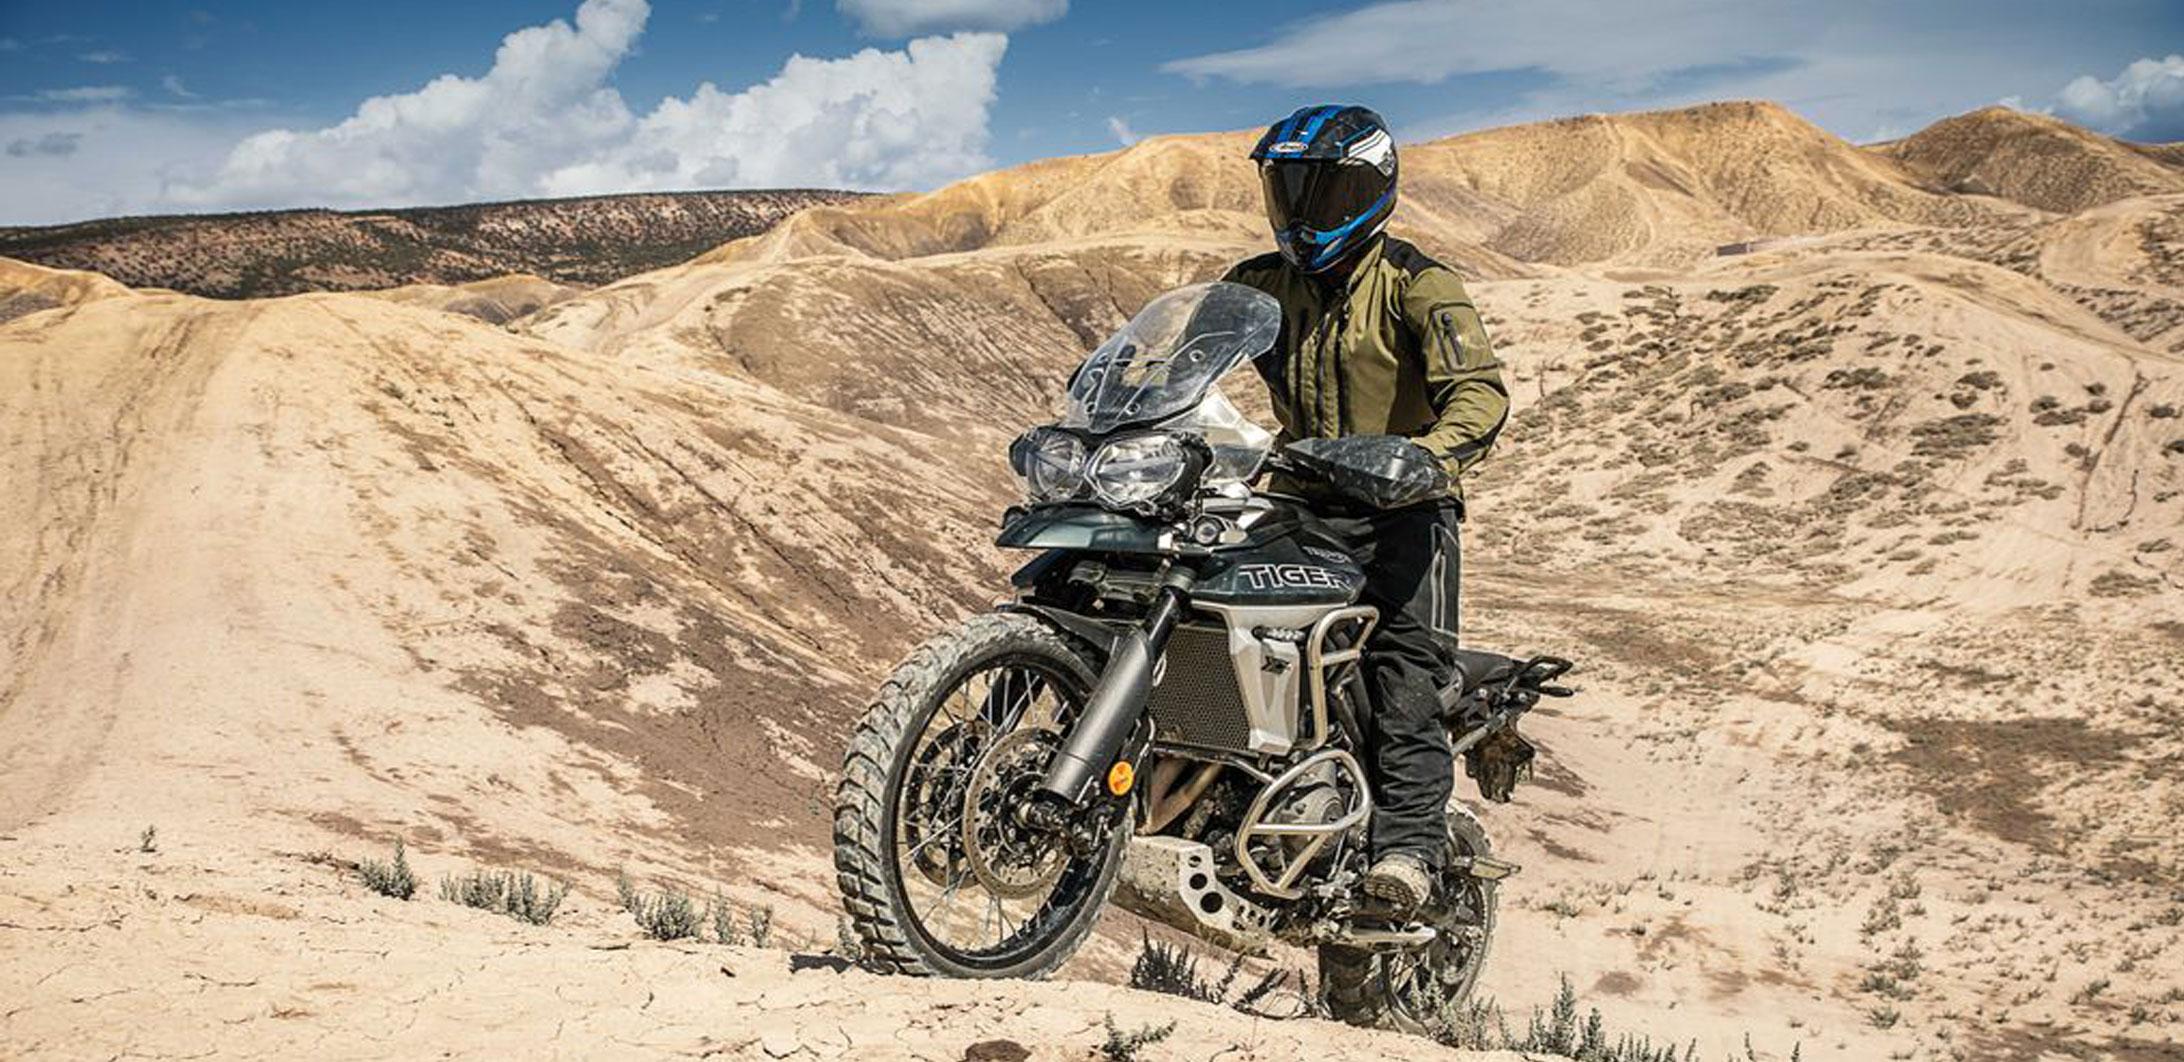 Tiger 800 XCA moto montreal